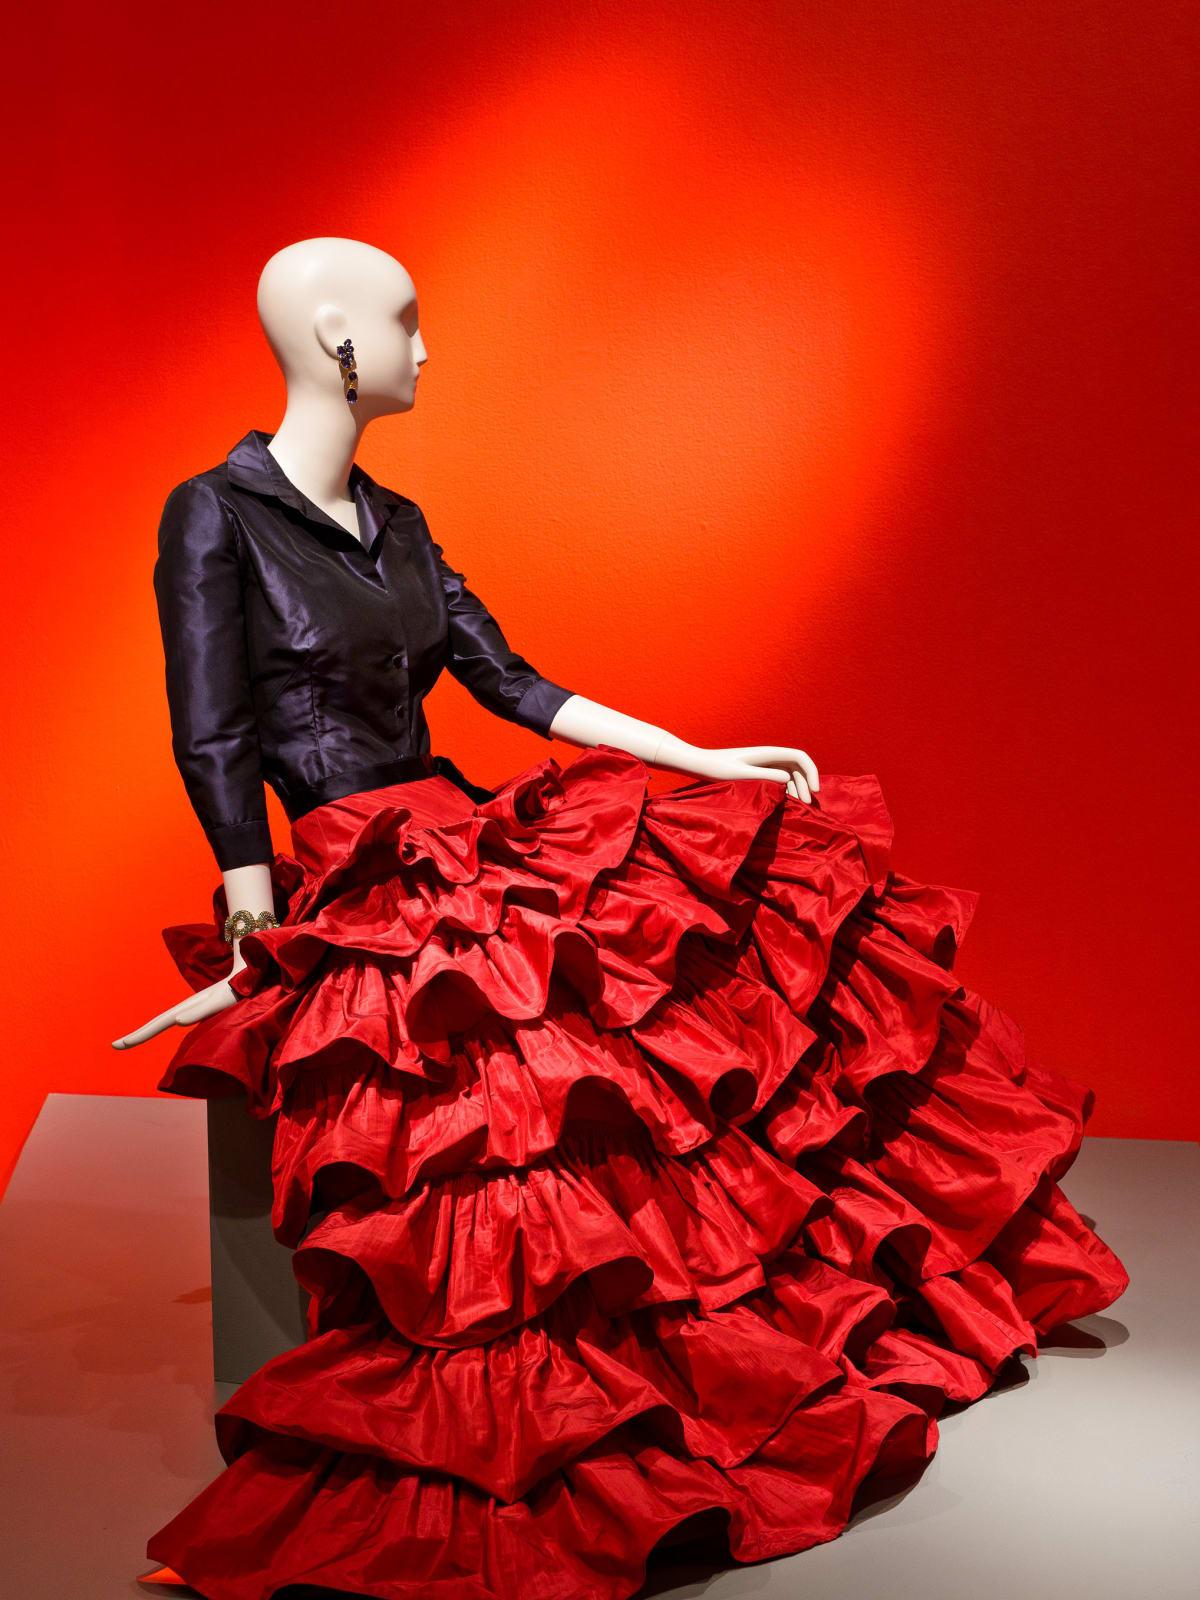 Oscar de la Renta, Custom Evening Ensemble, 2001, silk taffeta and silk satin, courtesy of Oscar de la Renta Archive (worn by Mica Ertegun to an event celebrating her 40th wedding anniversary to Ahmet Ertegun, 2001